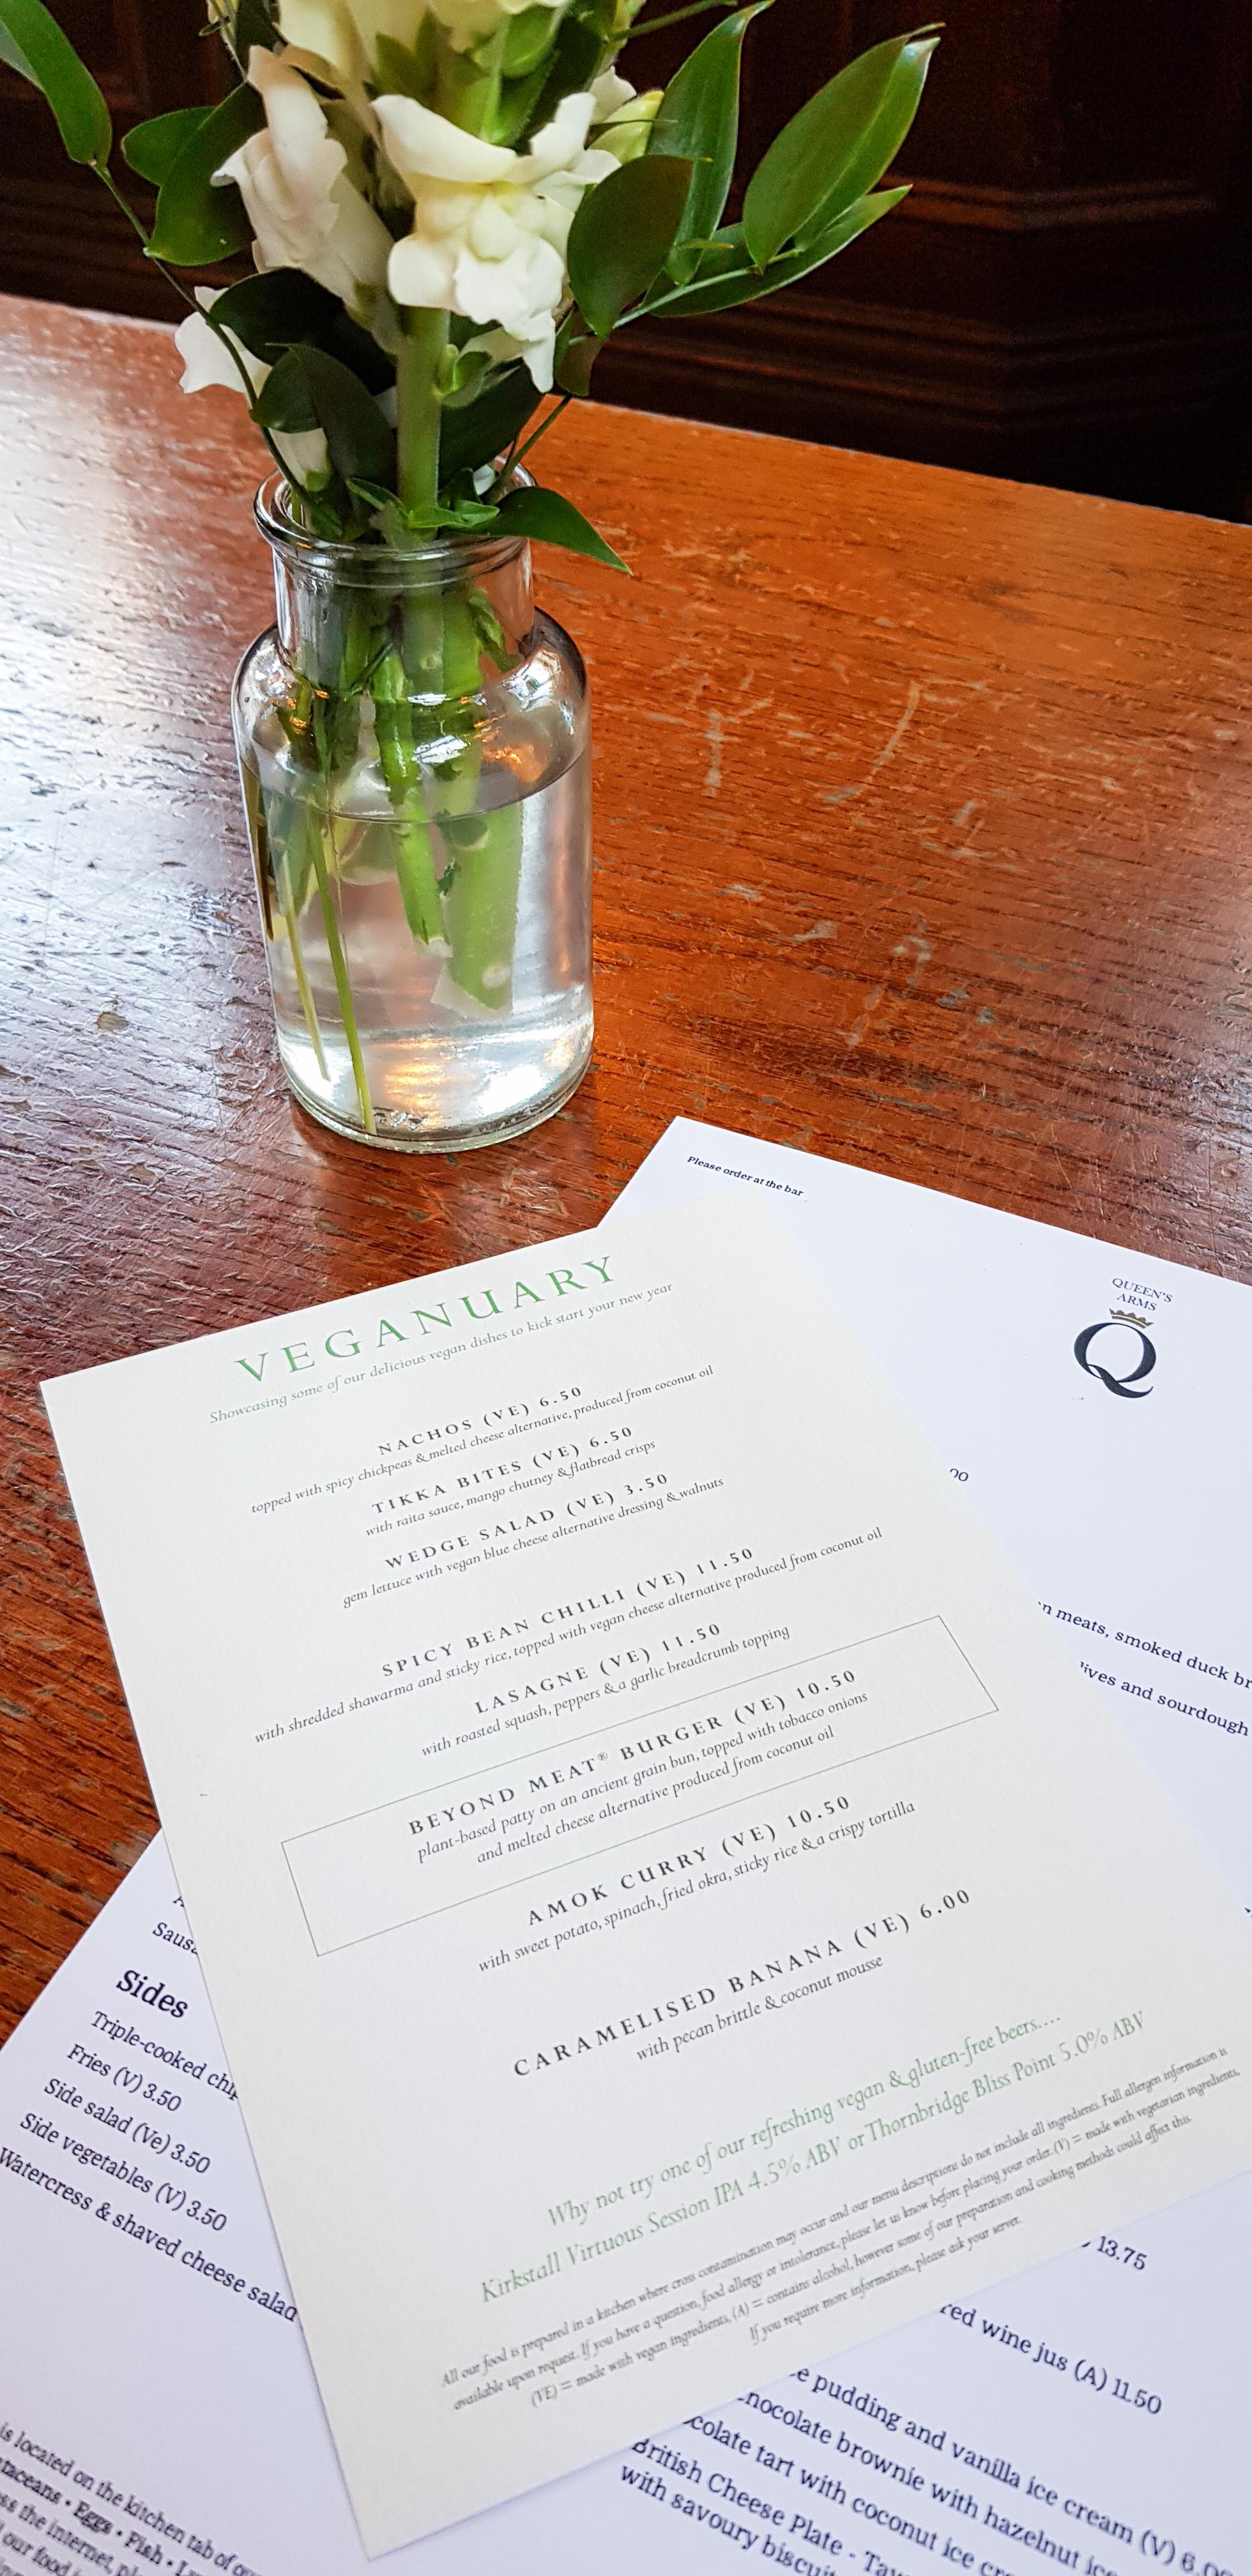 scavenger hunt London. cheap, fun dates in london. The enchanted mirror review. vegan food